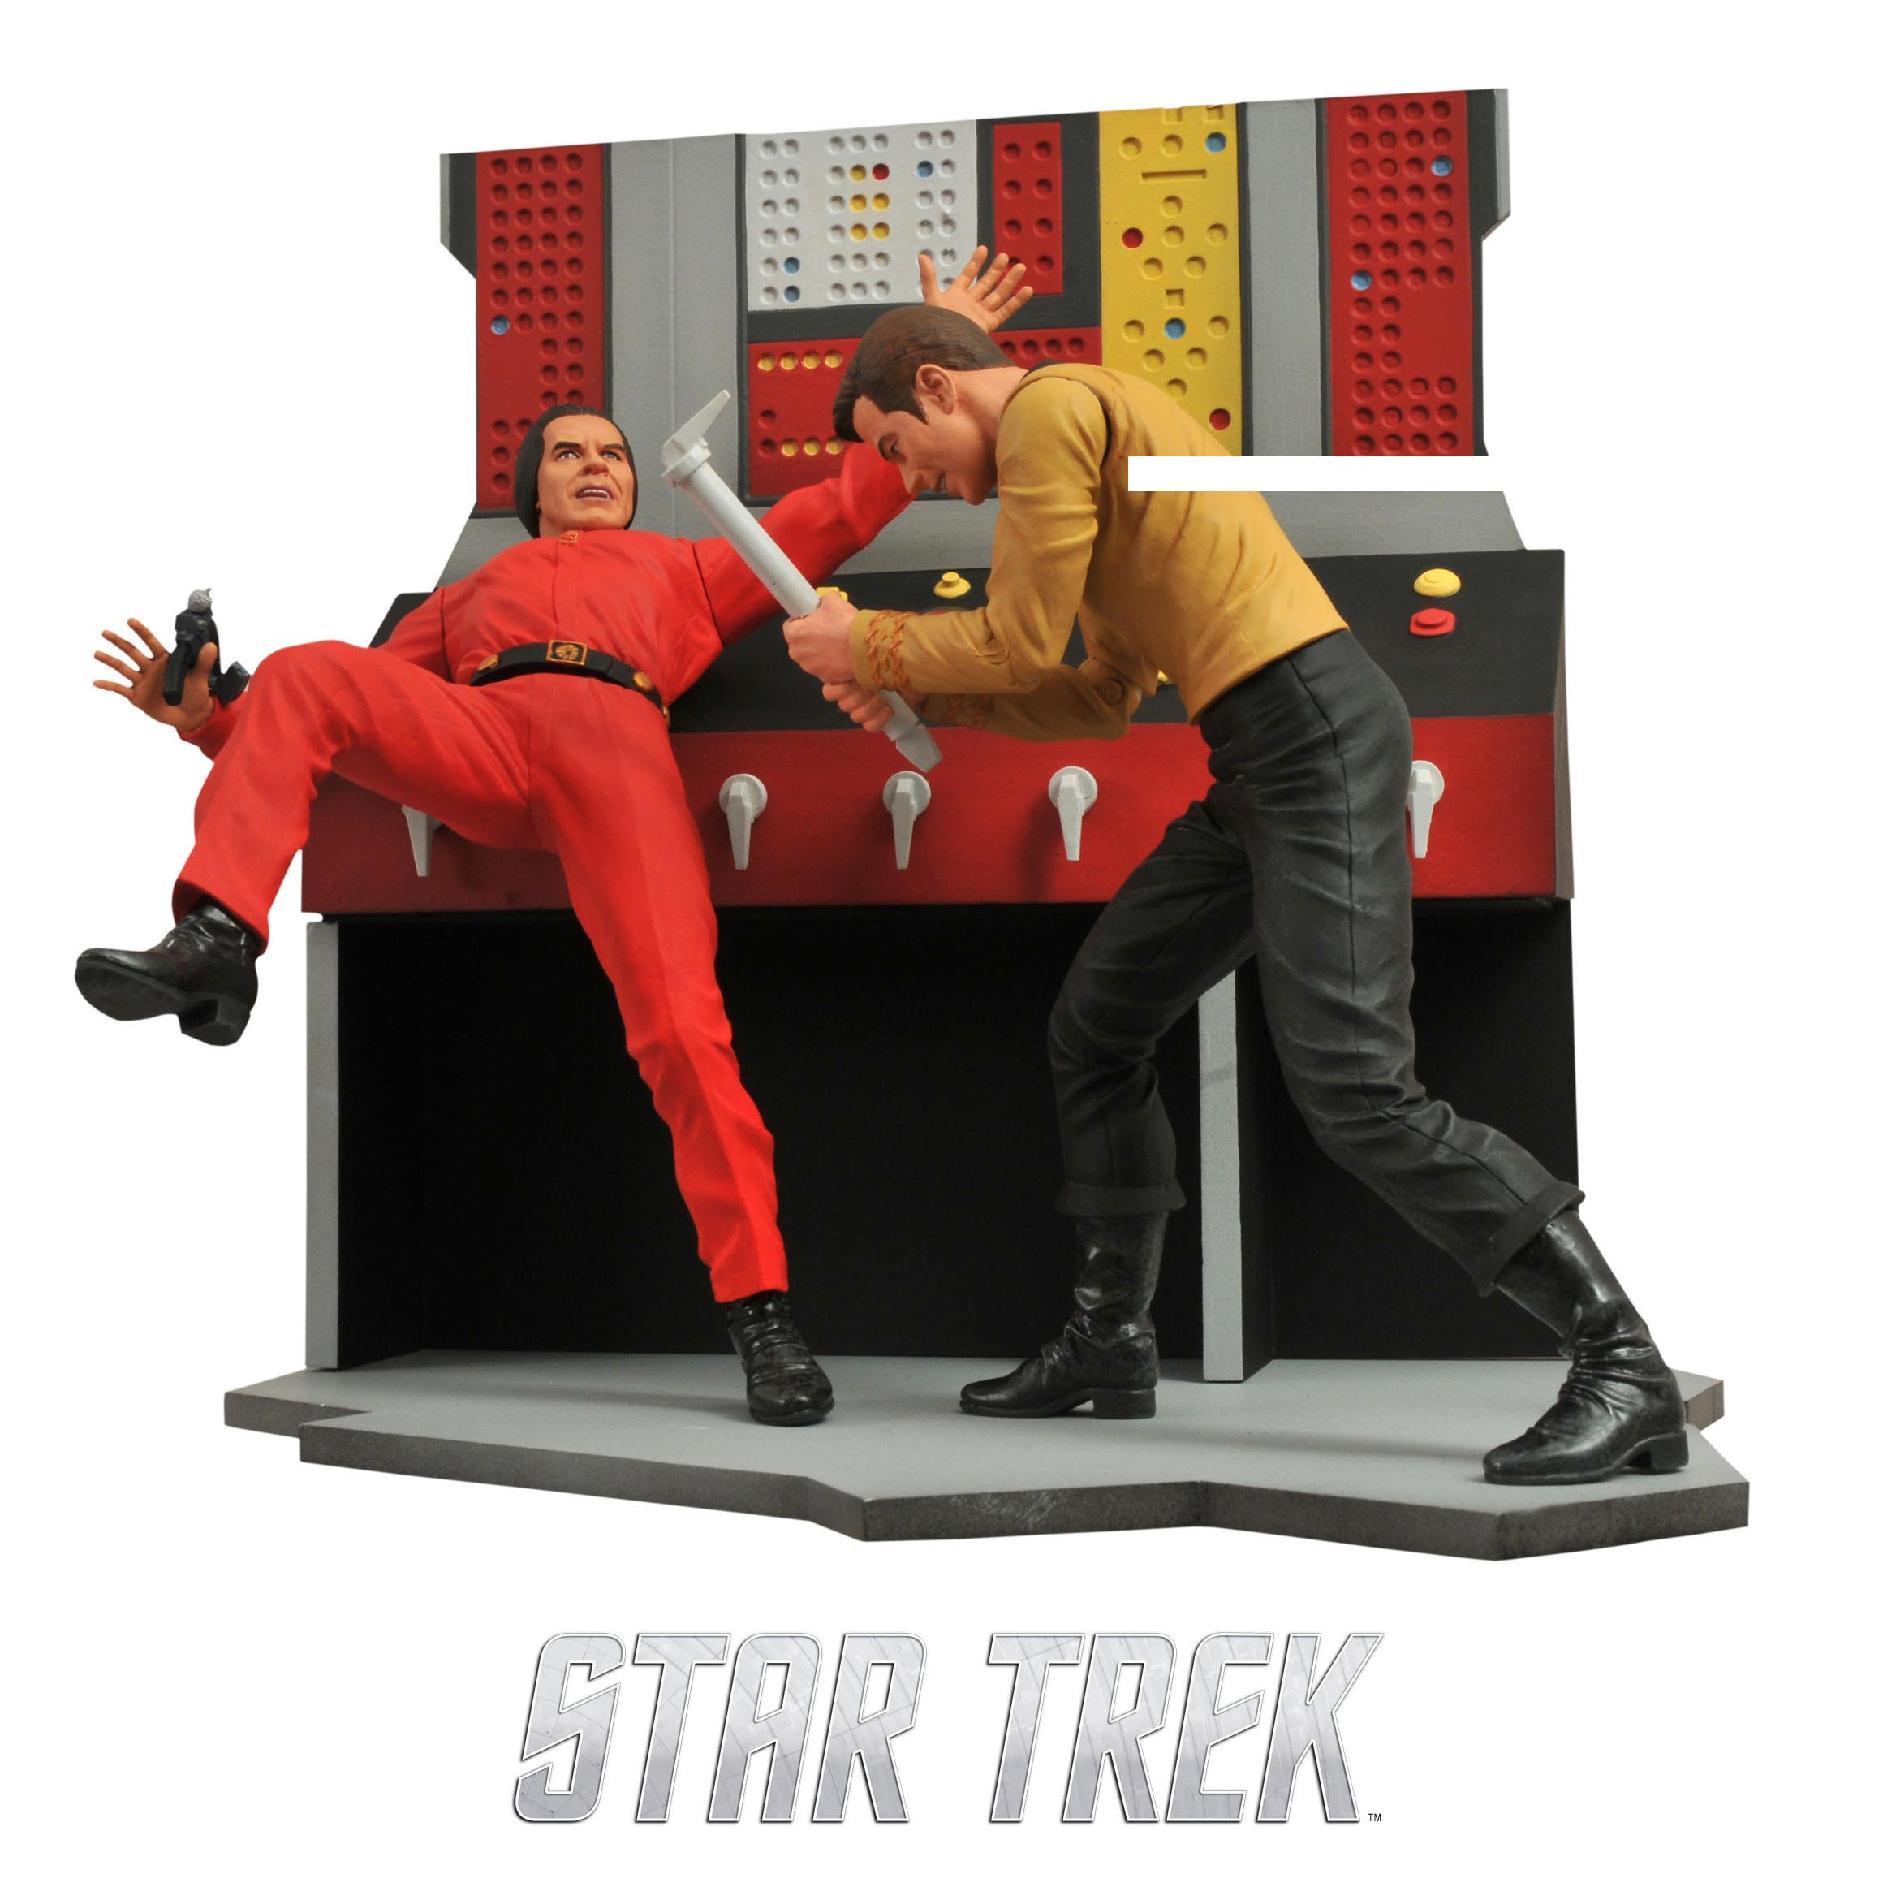 Star Trek Select: Kirk Action Figure PartNumber: 05237593000P